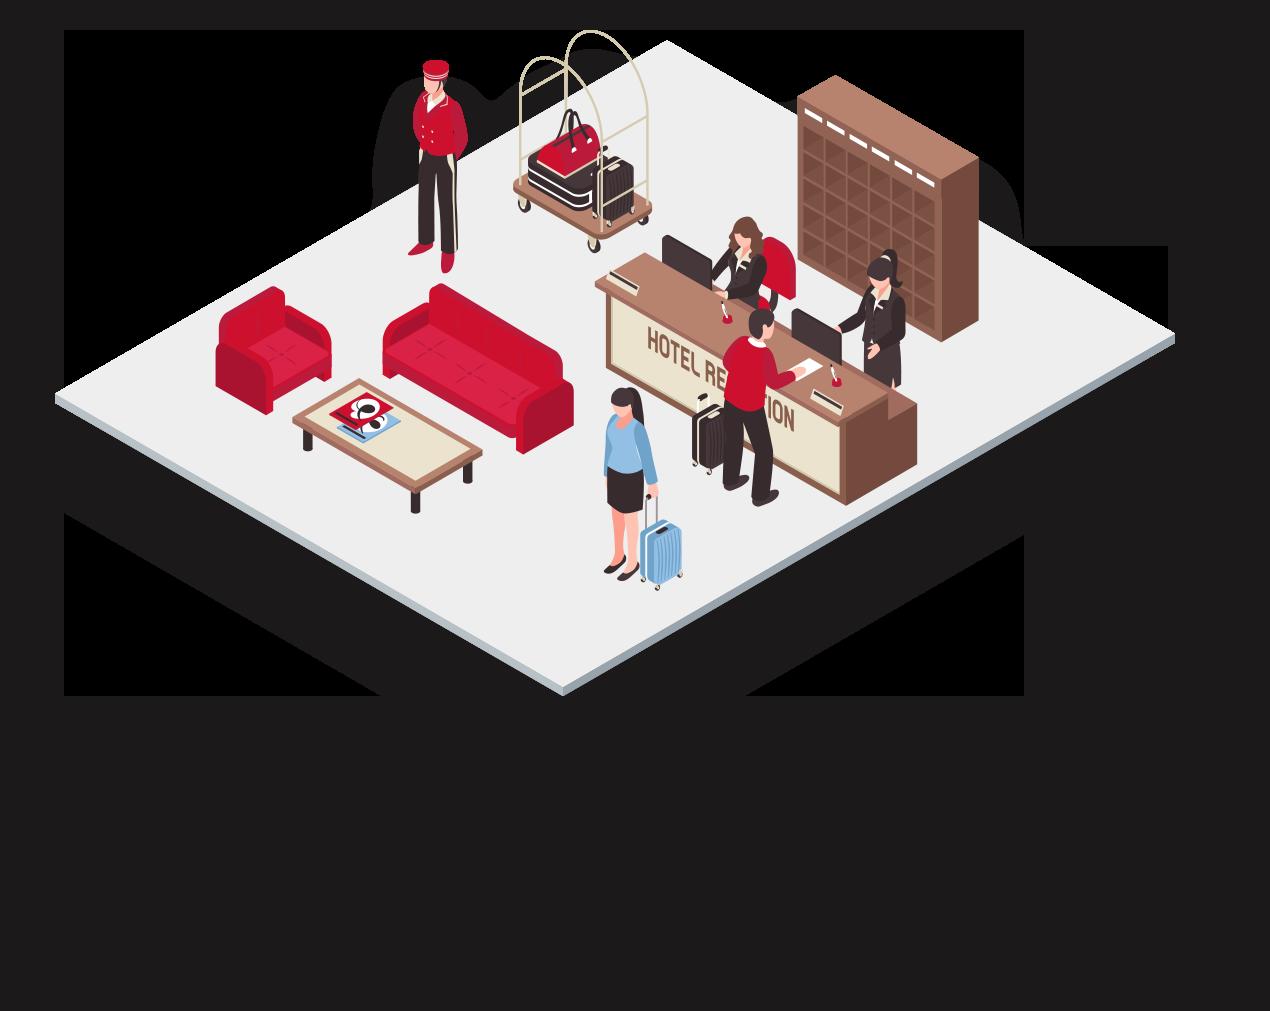 Infor Hospitality Inforgraphic